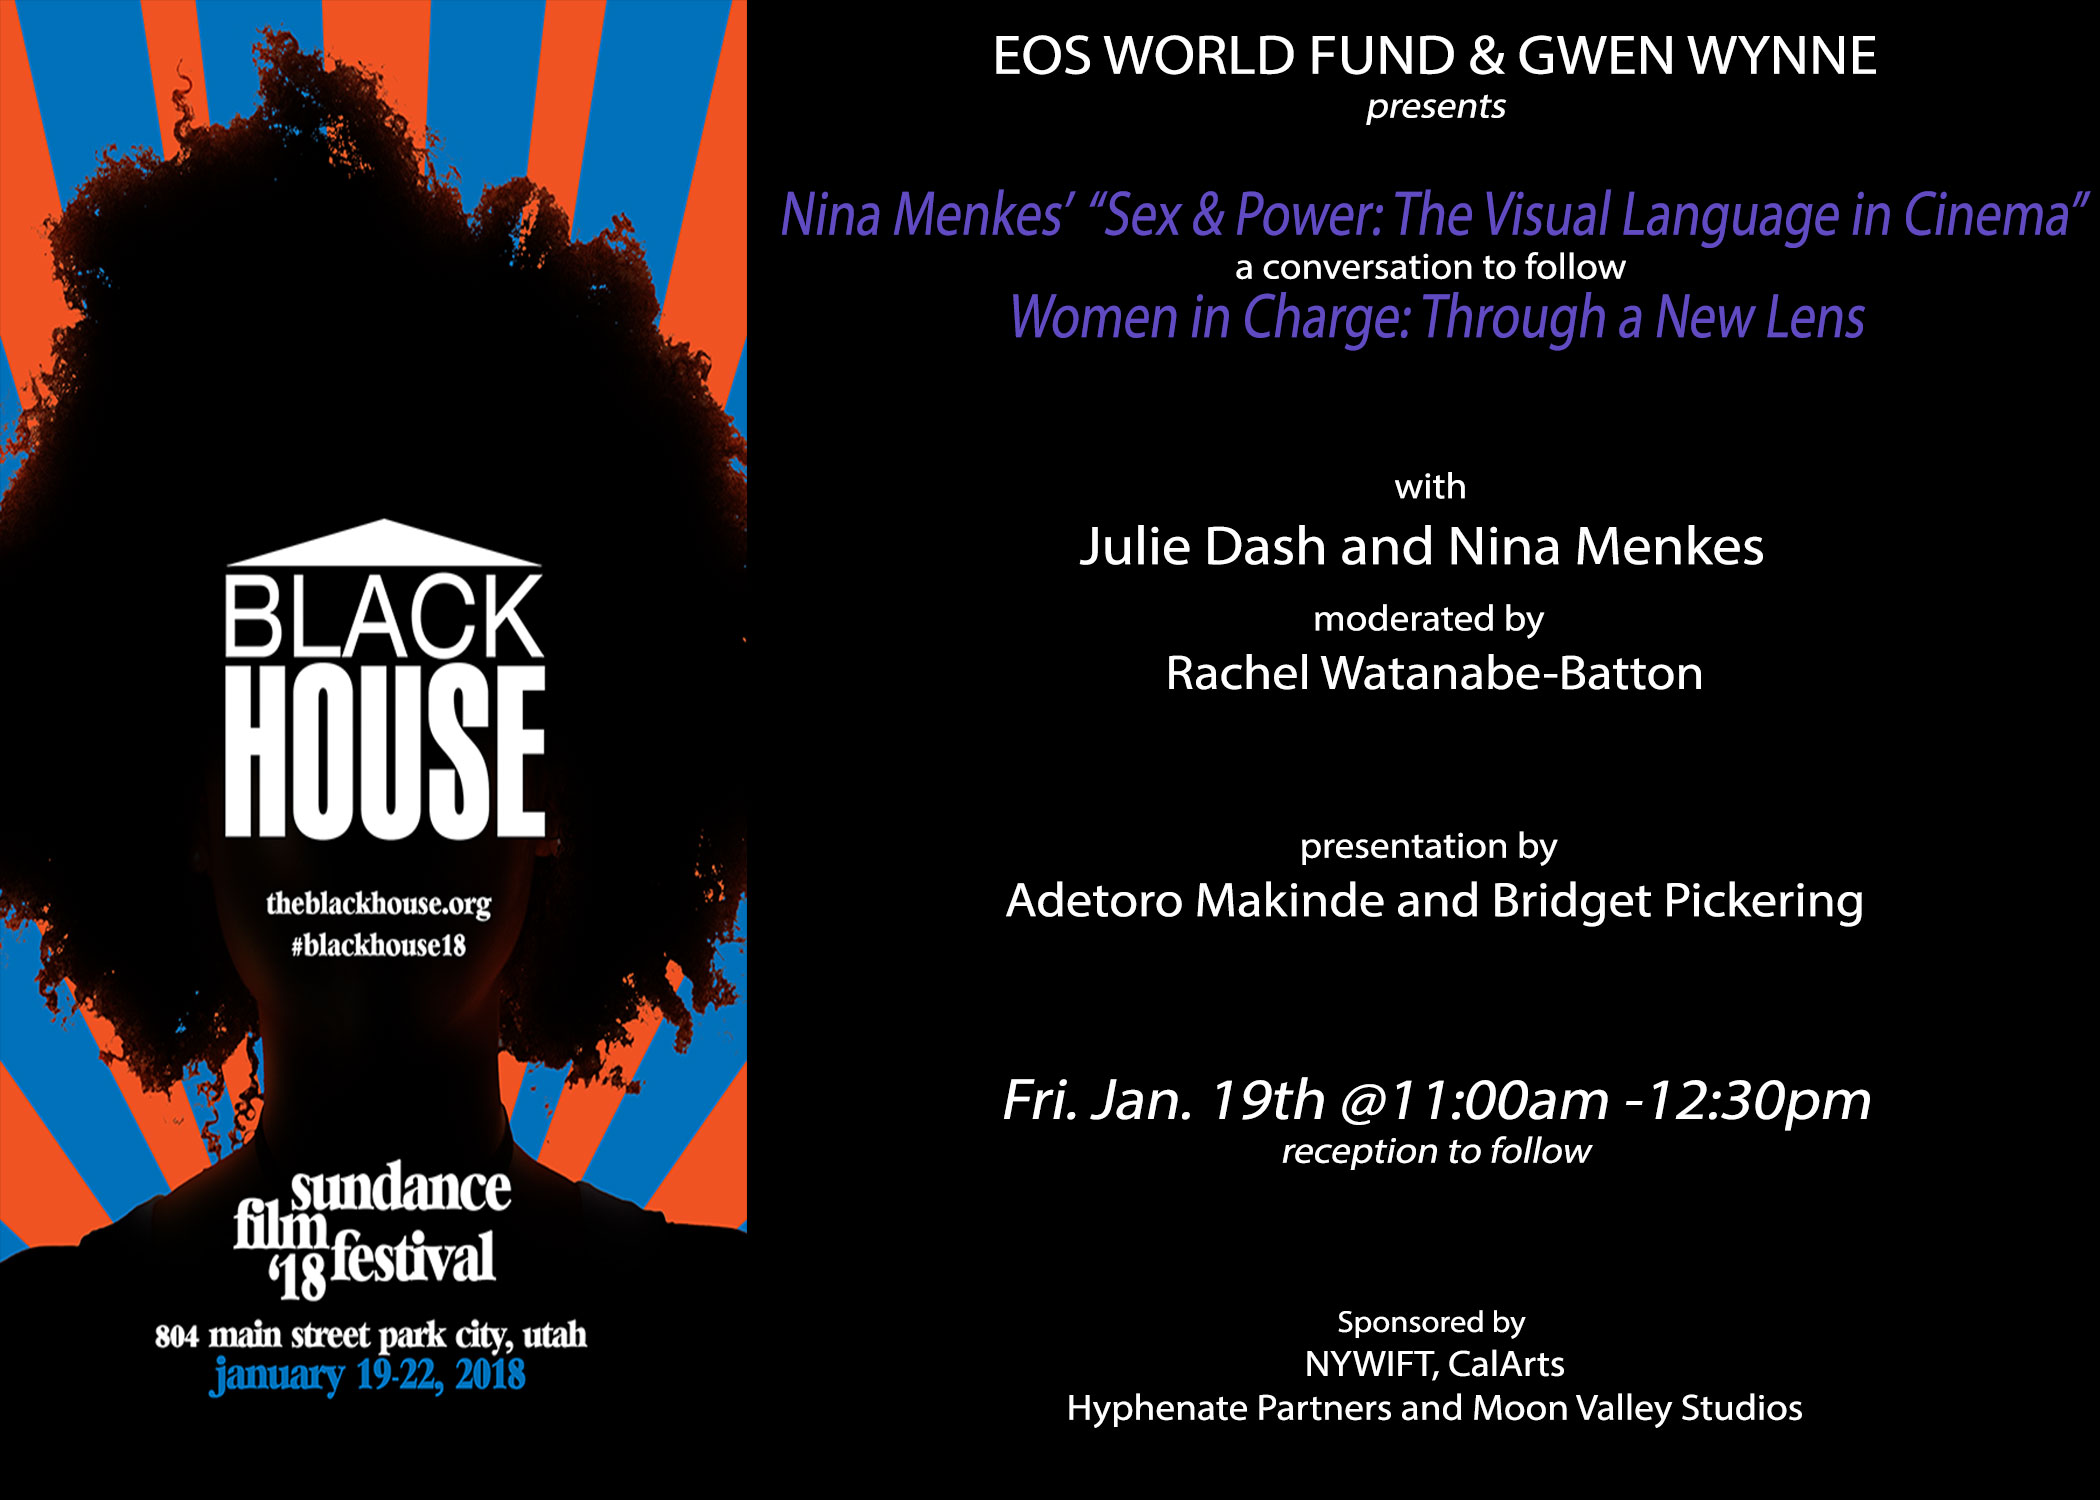 Blackhouse-EOS-Panel_ FINAL.jpg